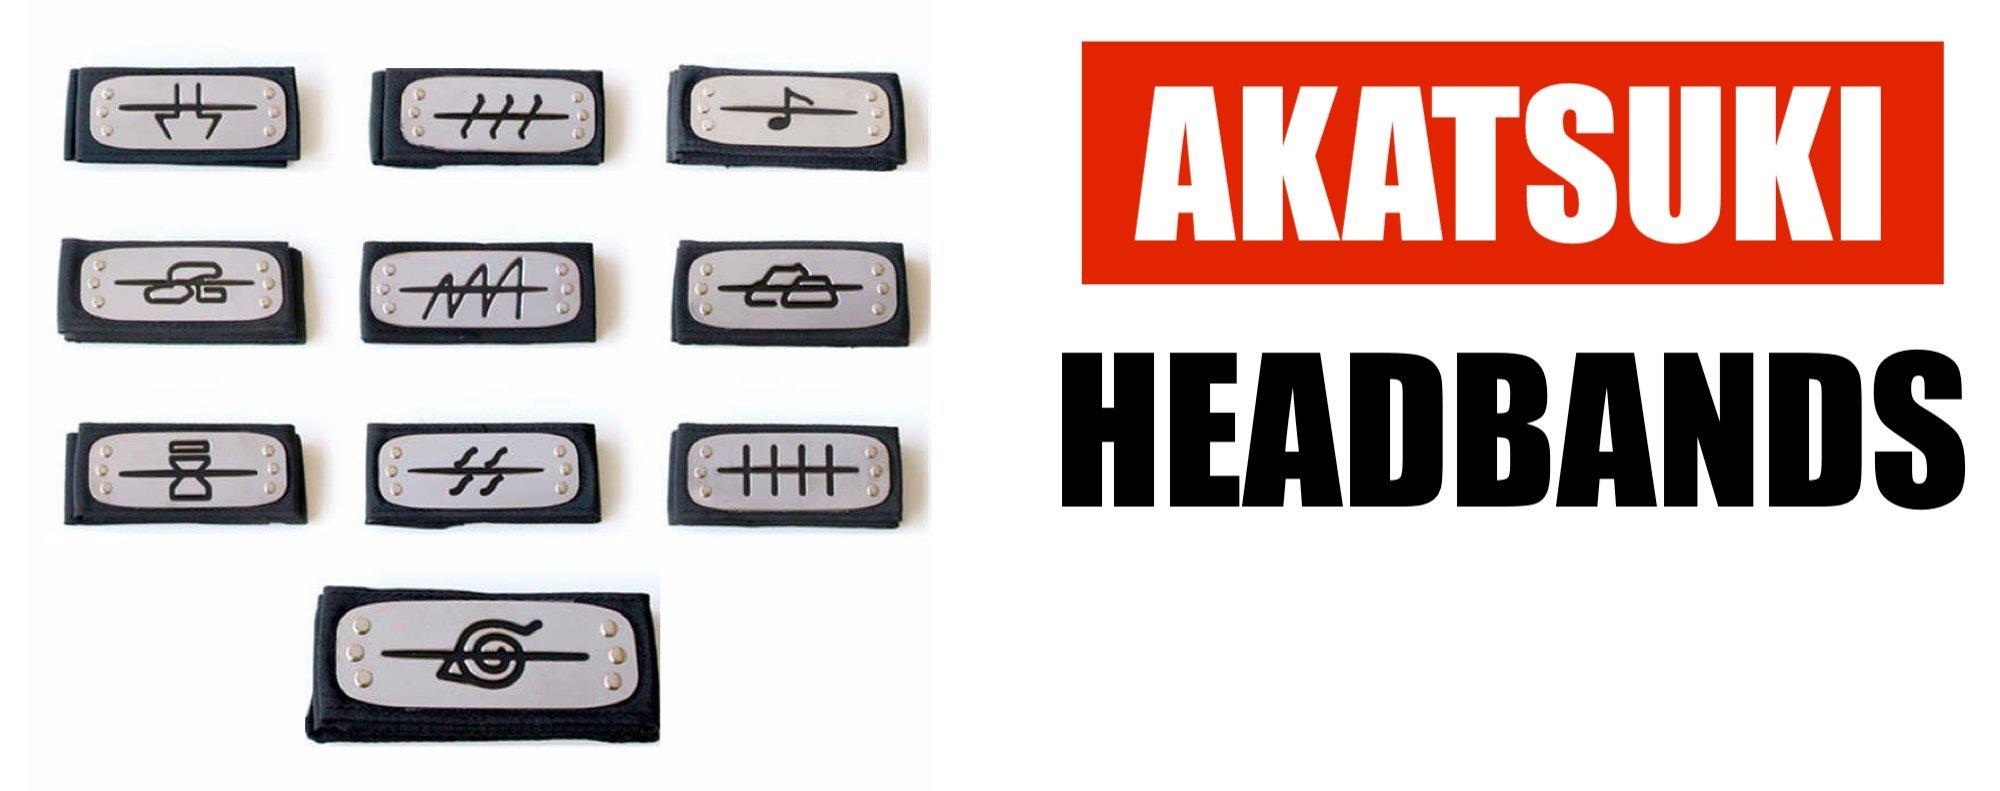 Akatsuki Headband Symbols